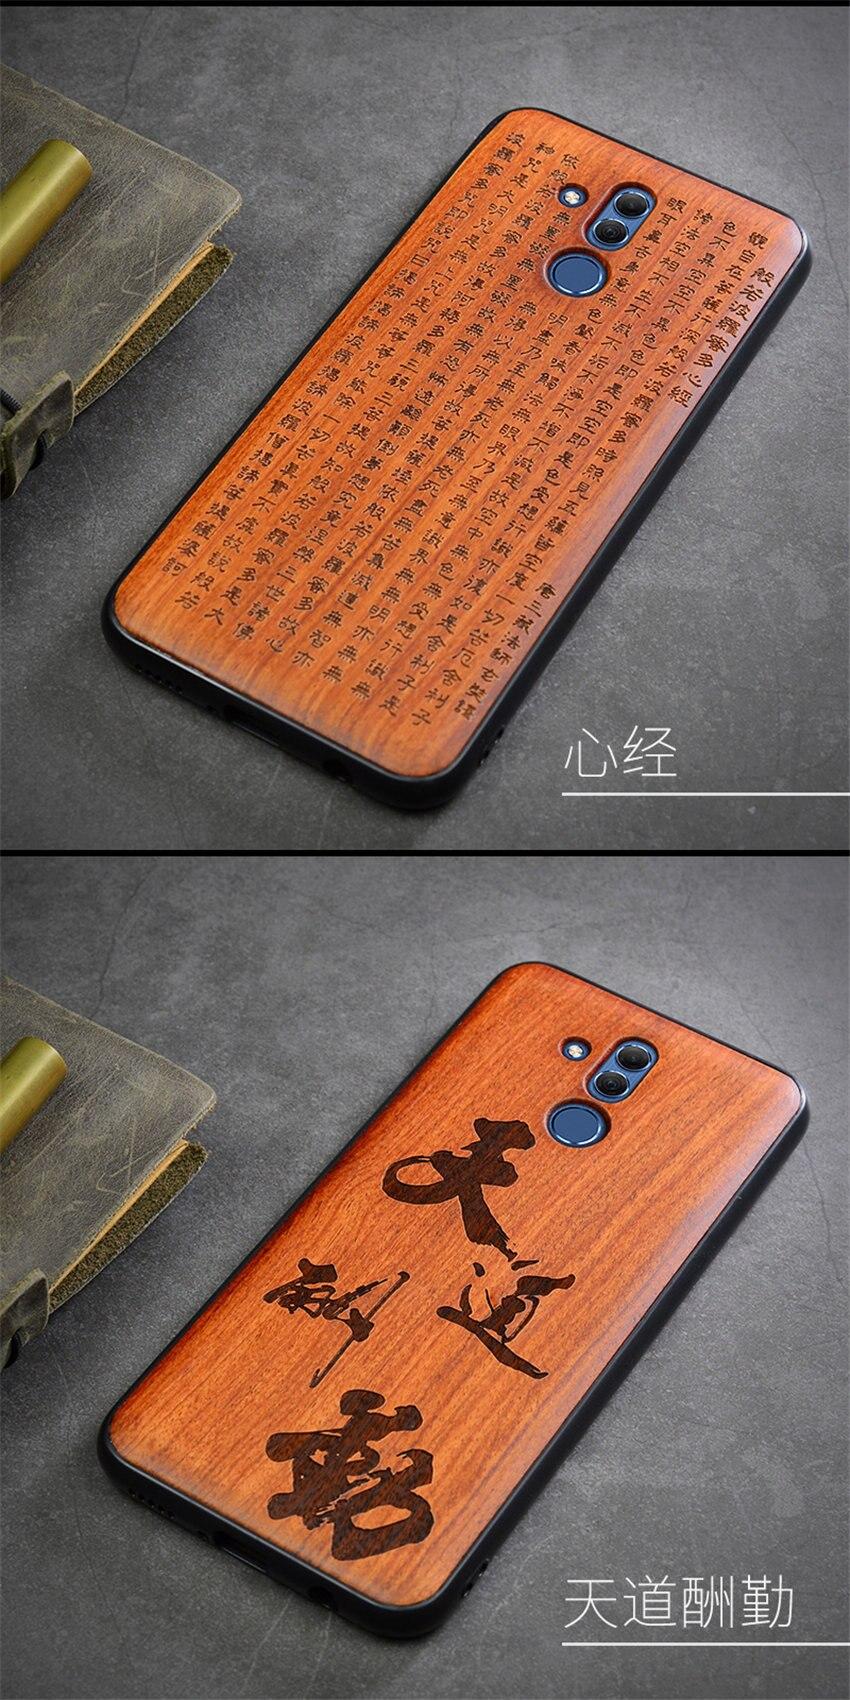 2018 New Huawei Mate 20 Lite Case Slim Wood Back Cover TPU Bumper Case For Huawei Mate 20 Lite Phone Cases Mate20 lite (14)